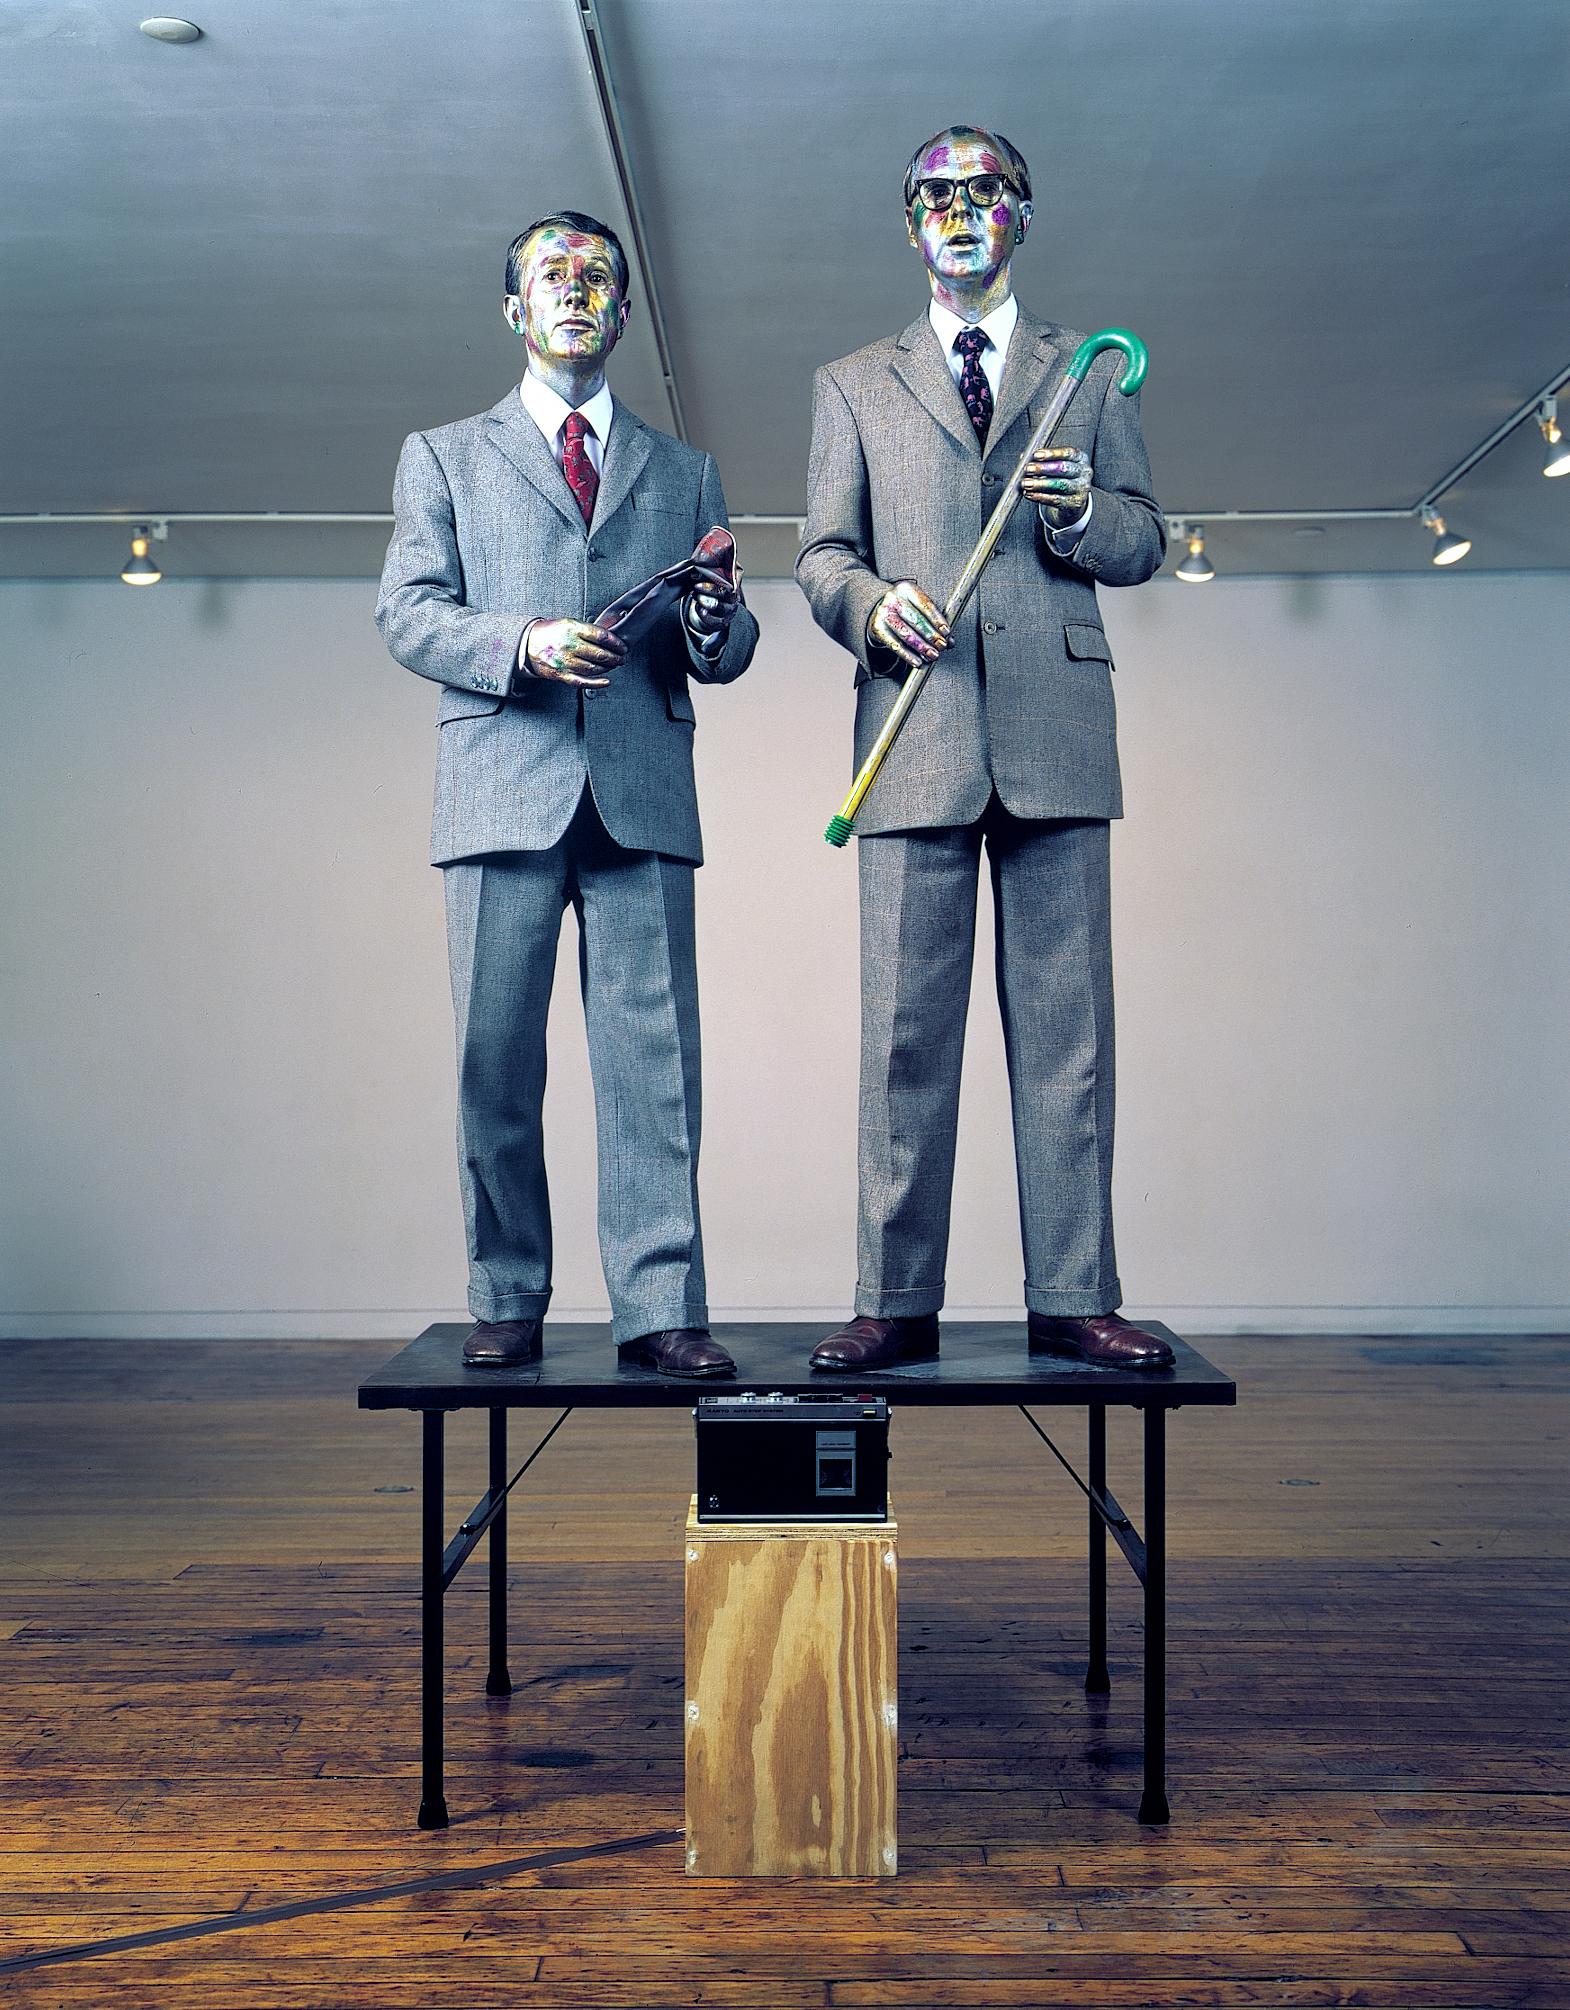 Gilbert & George: The Singing Sculpture, 1992